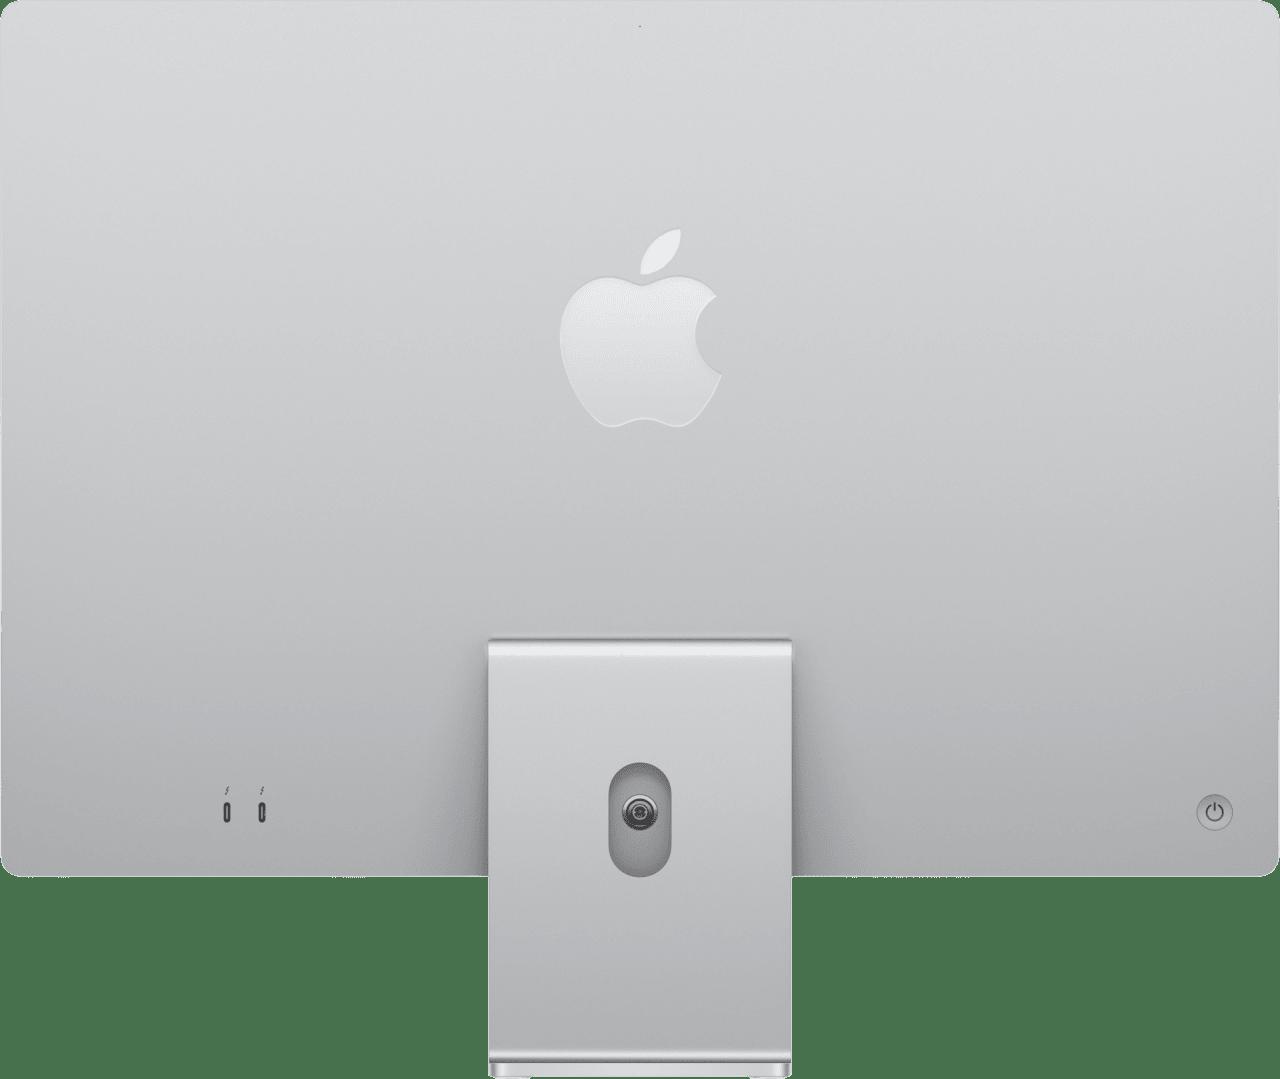 "Plata Apple 24"" iMac (mediados de 2021) - Inglés (QWERTY) All-in-One - Apple M1 - 8GB - 512GB SSD - Apple integrado GPU de 8 núcleos.3"